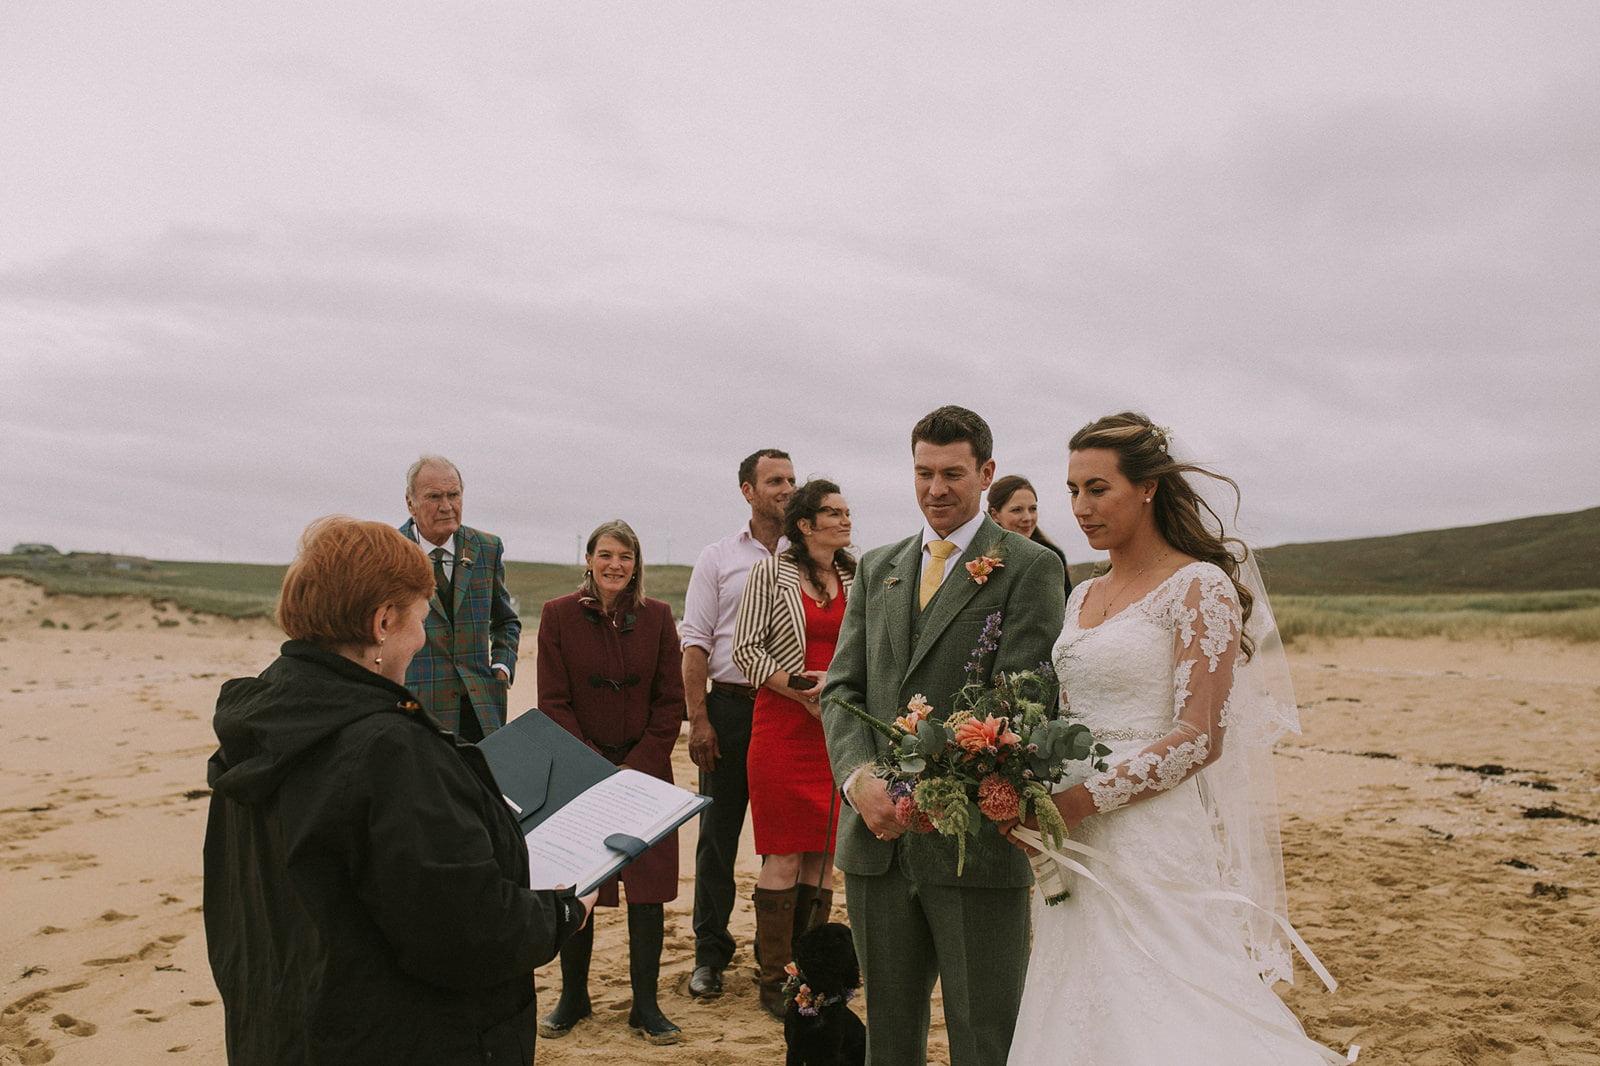 harris wedding inspiration